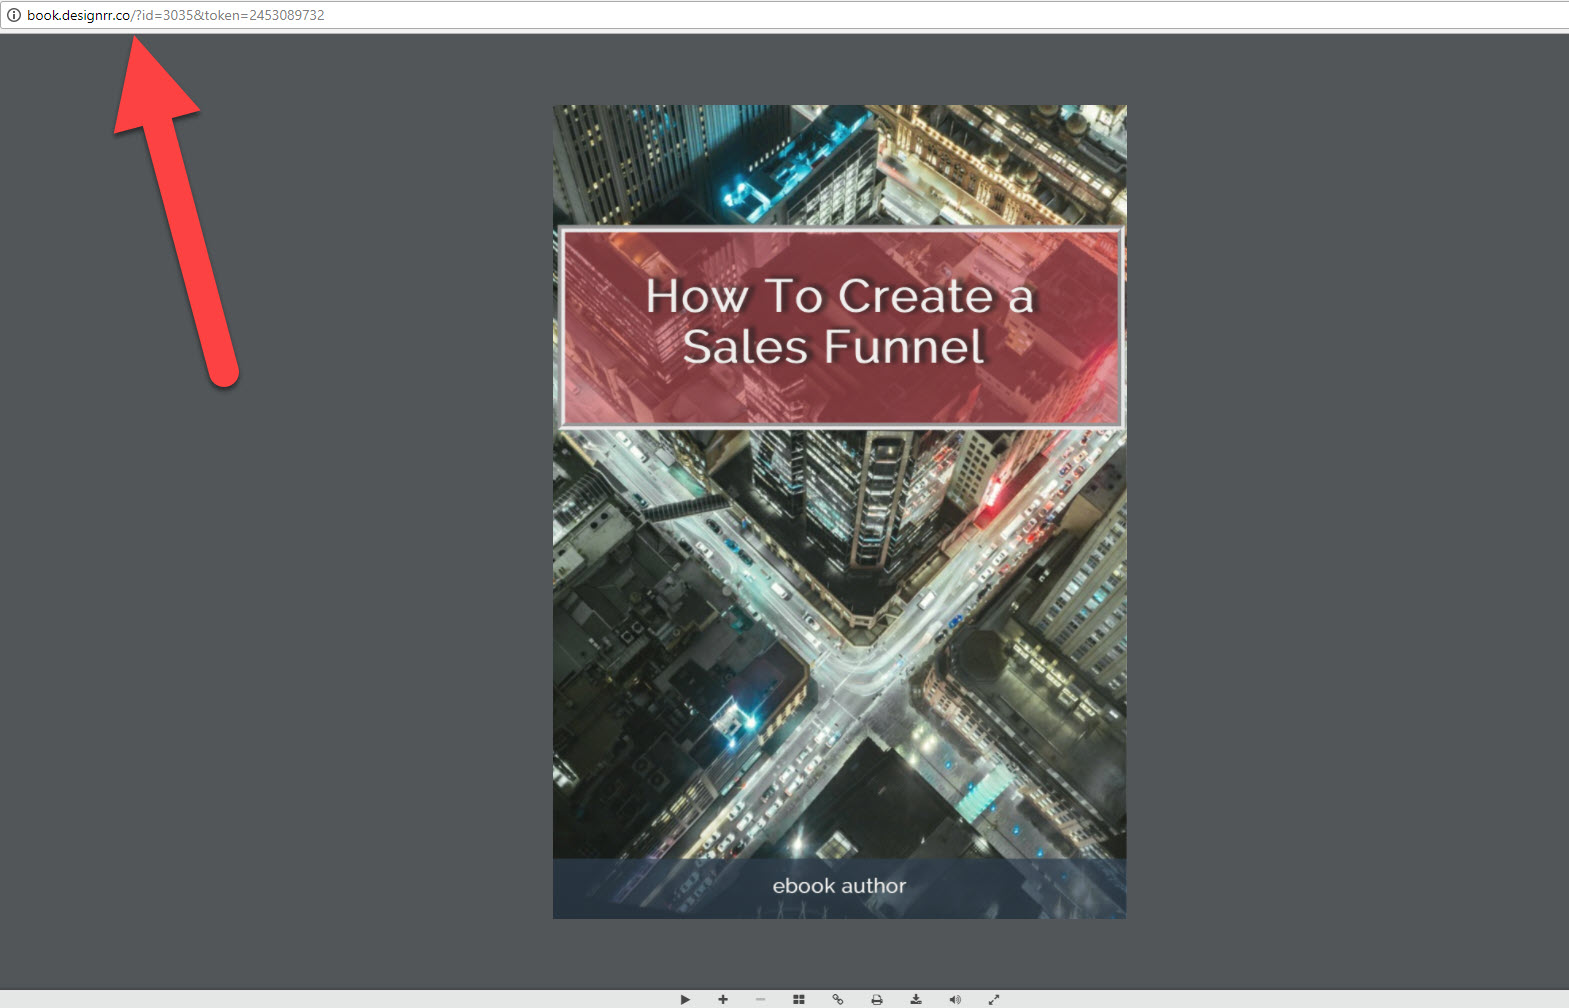 Flipbook Created - Copy URL